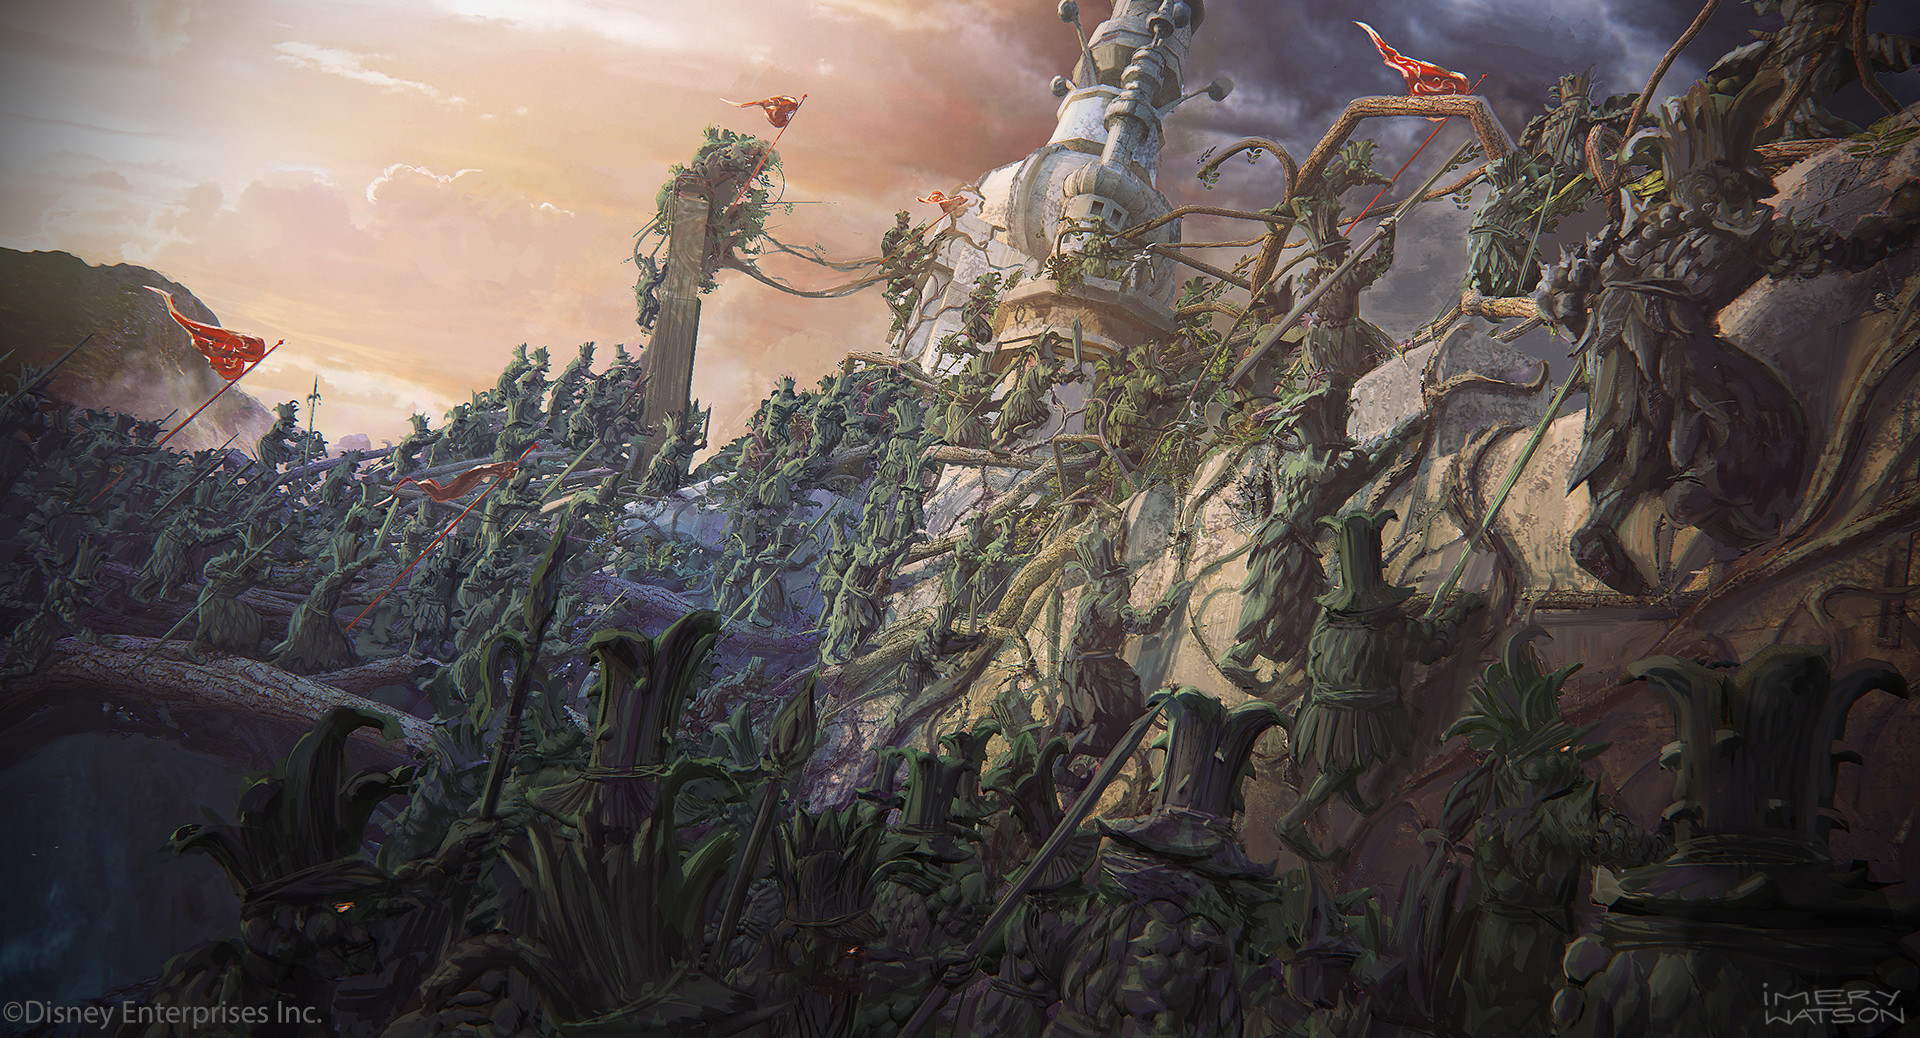 Imery watson battlefield wallstorm imerywatson